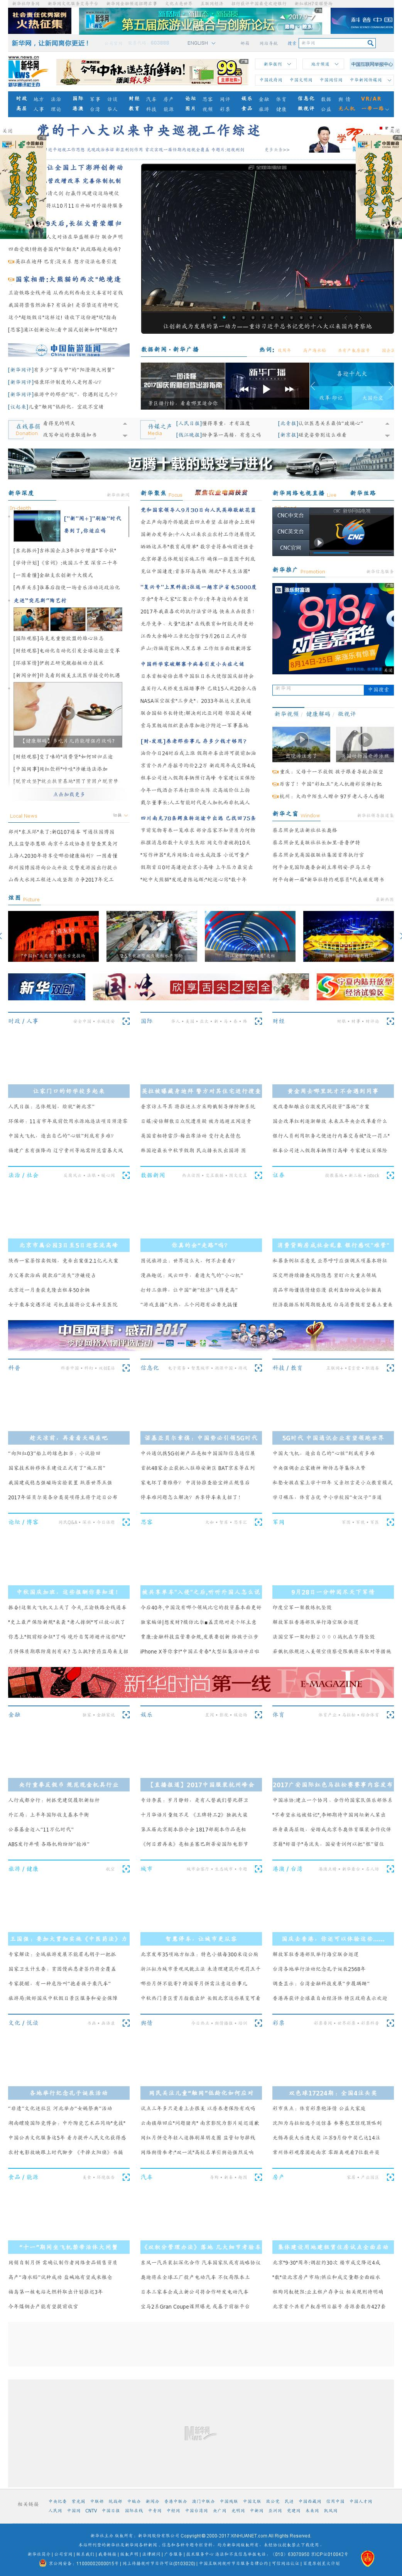 Xinhua at Friday Sept. 29, 2017, 7:20 a.m. UTC